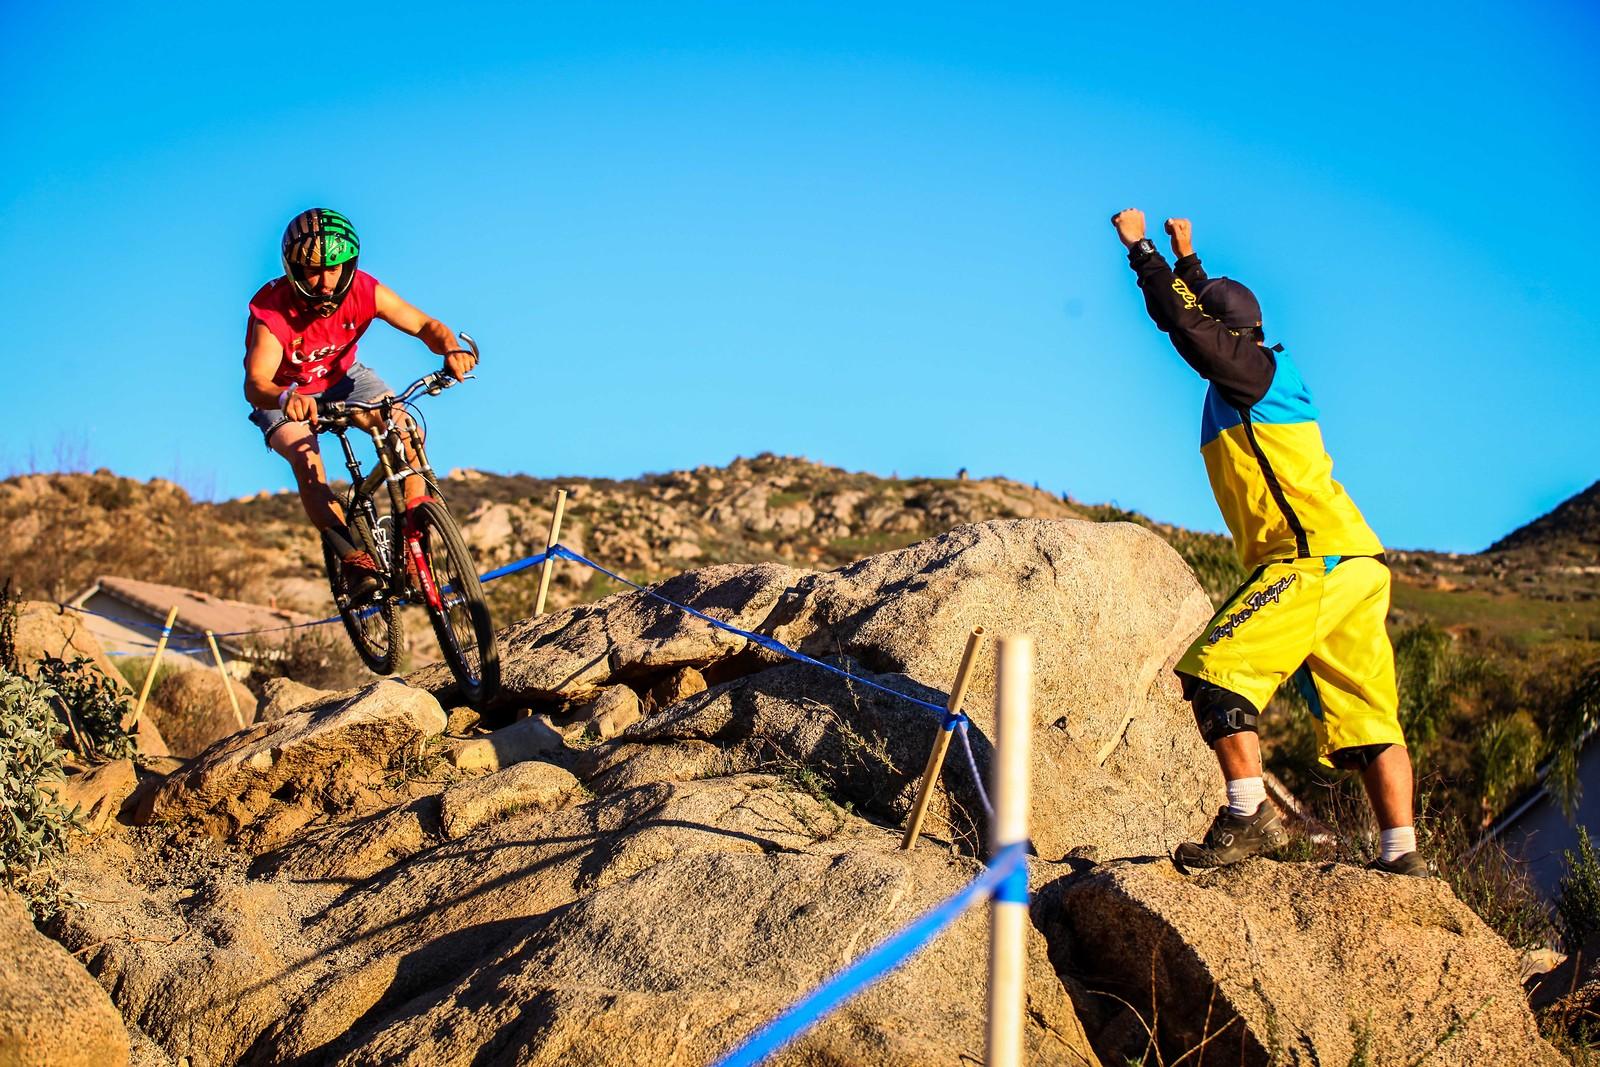 . - GnarHuck - Mountain Biking Pictures - Vital MTB